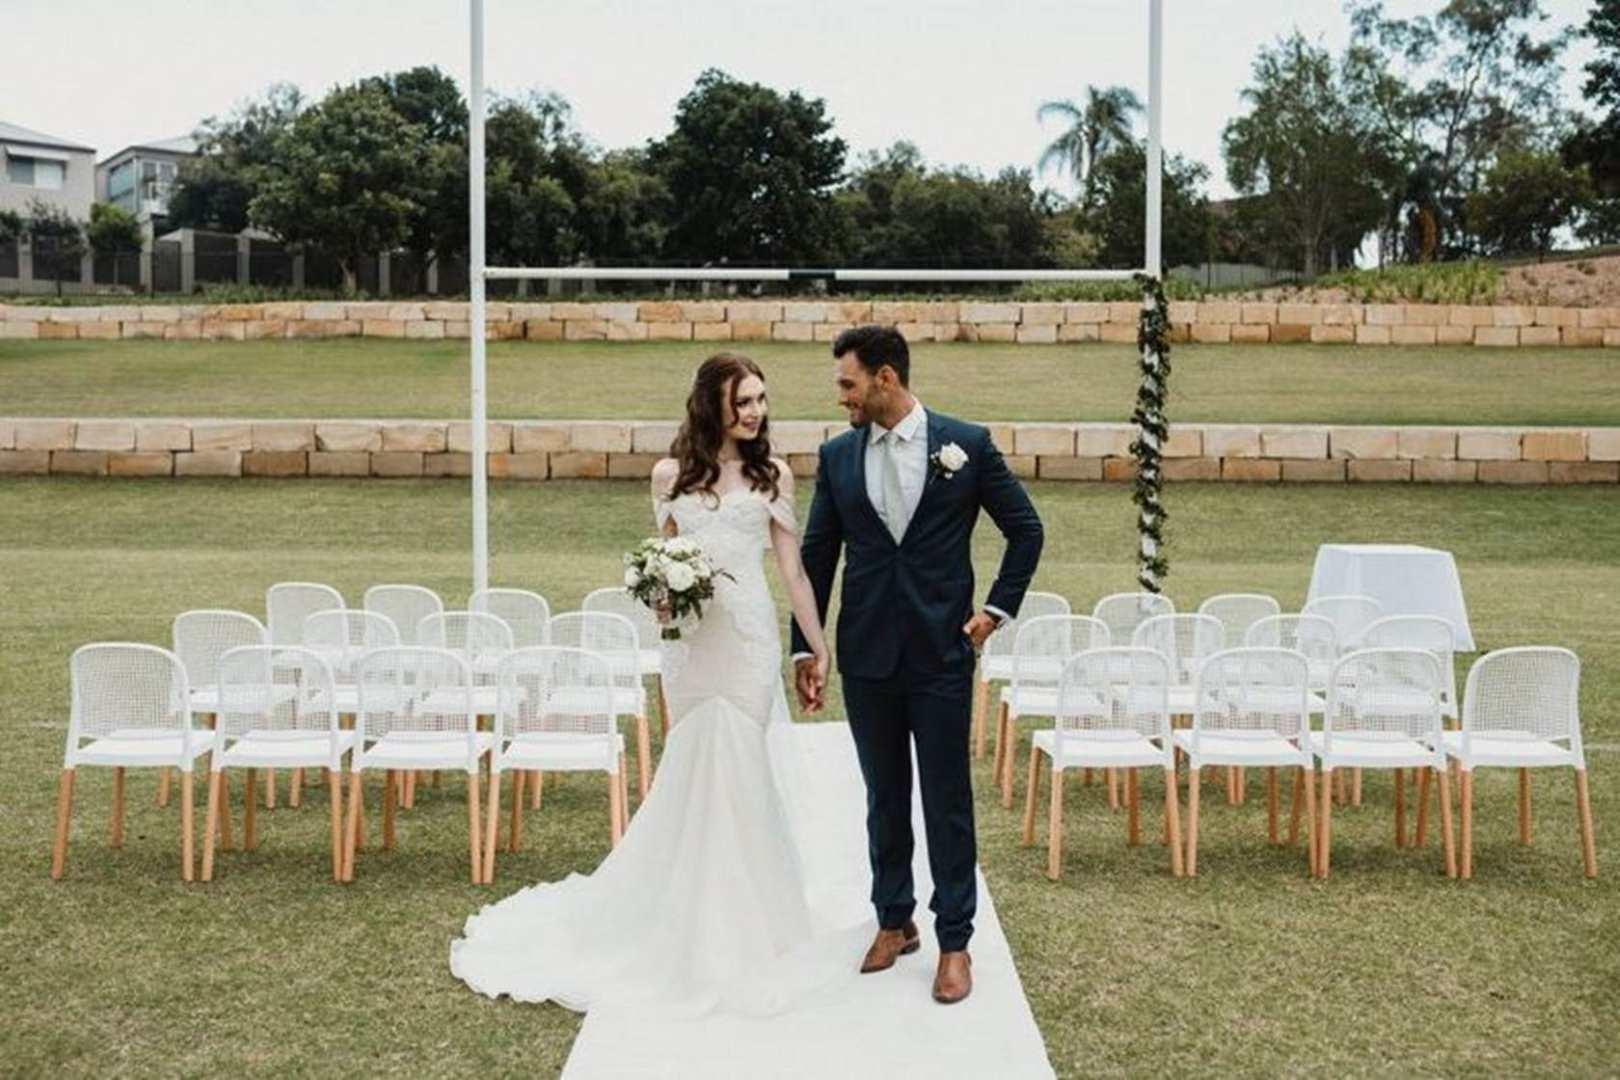 Wedding Venue - Figs on Sylvan 3 on Veilability